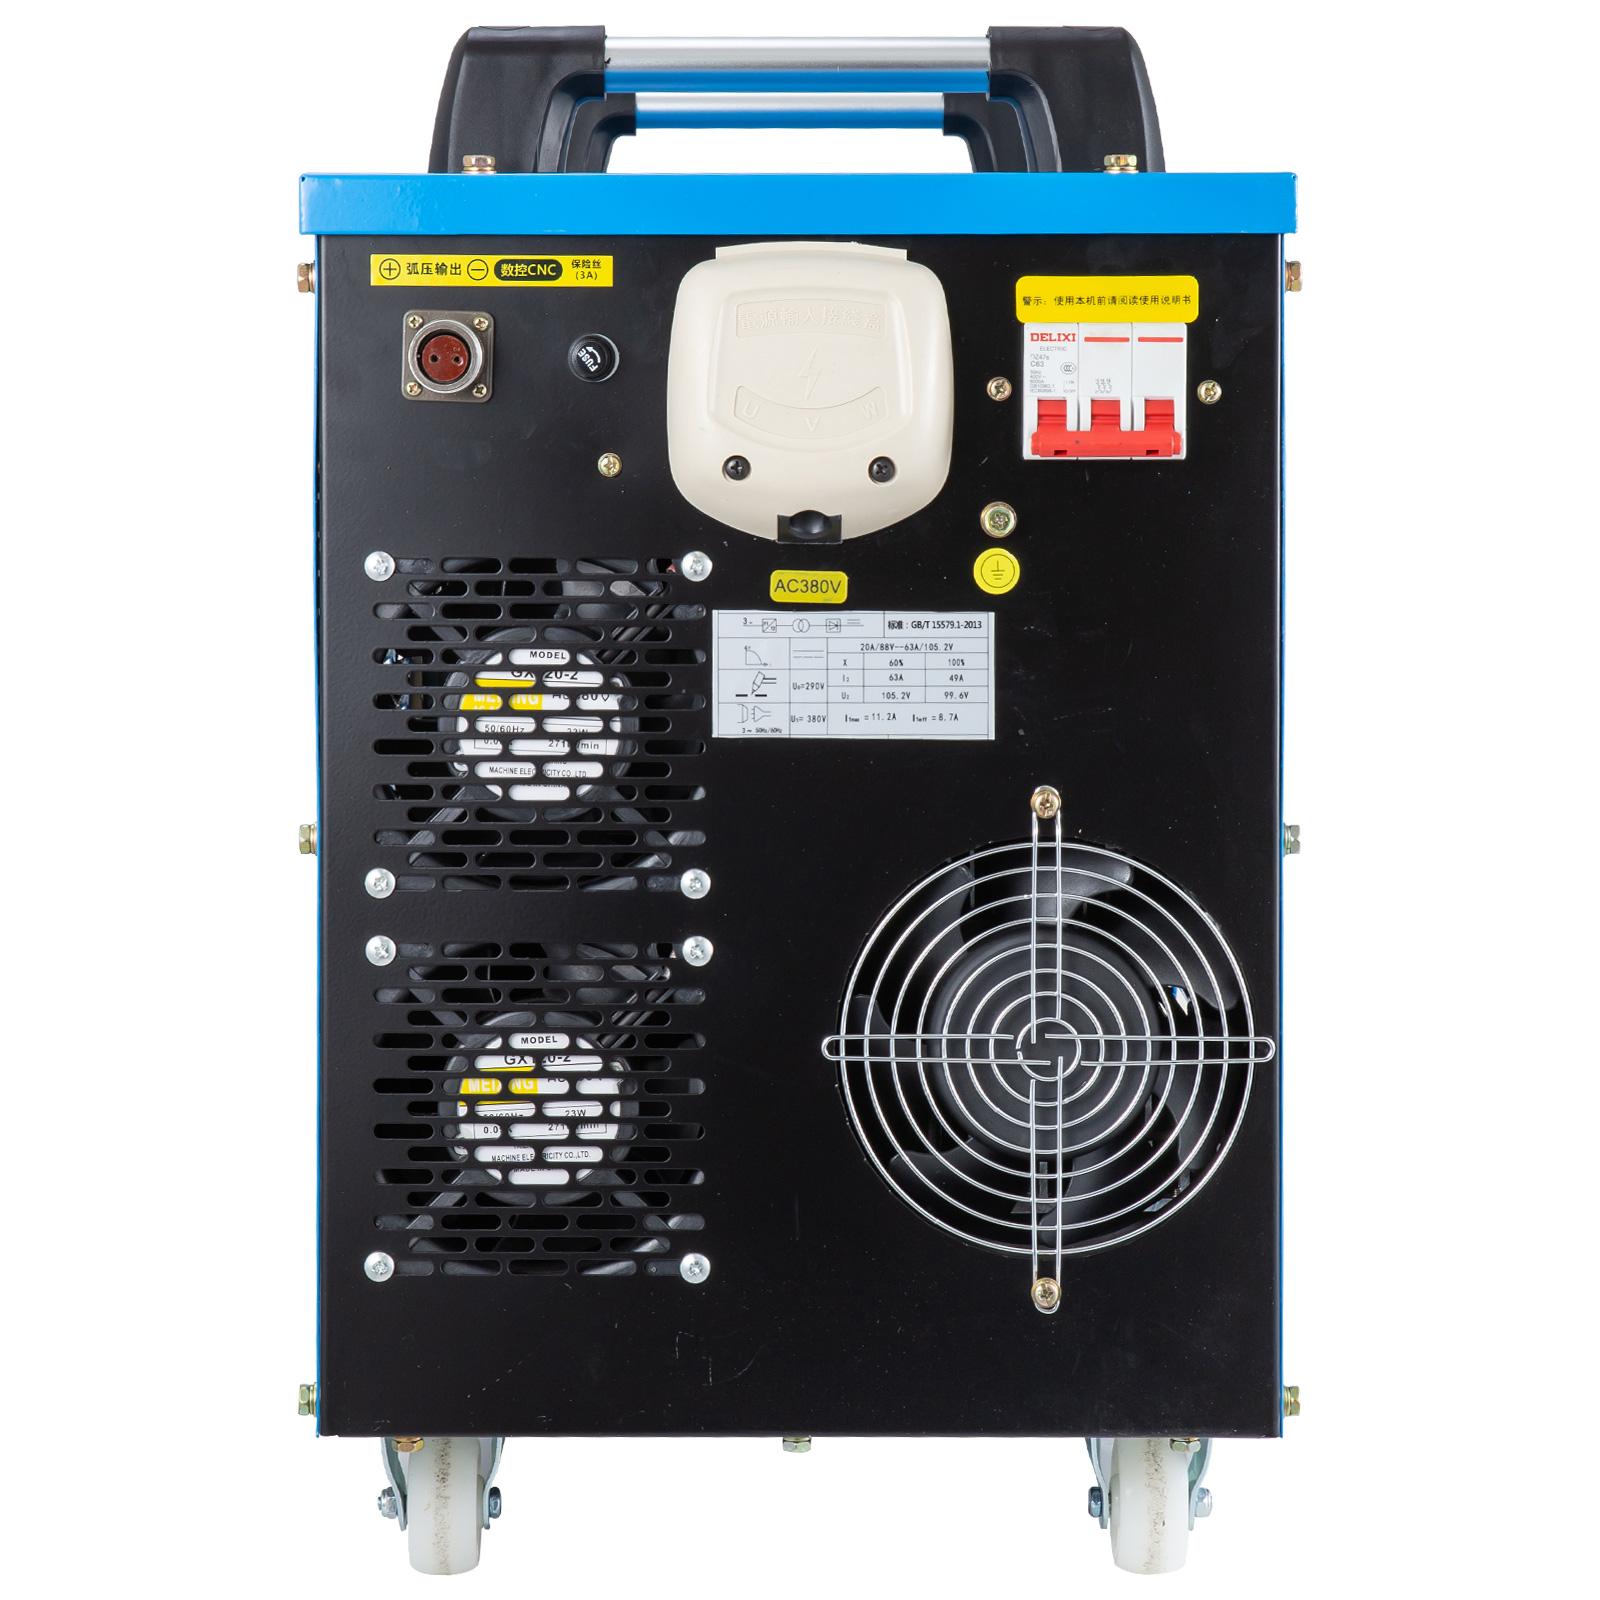 40-85A-Plasma-Cutter-Built-In-Air-Compressor-Inverter-Cutting-Machine-Cut-35mm thumbnail 60